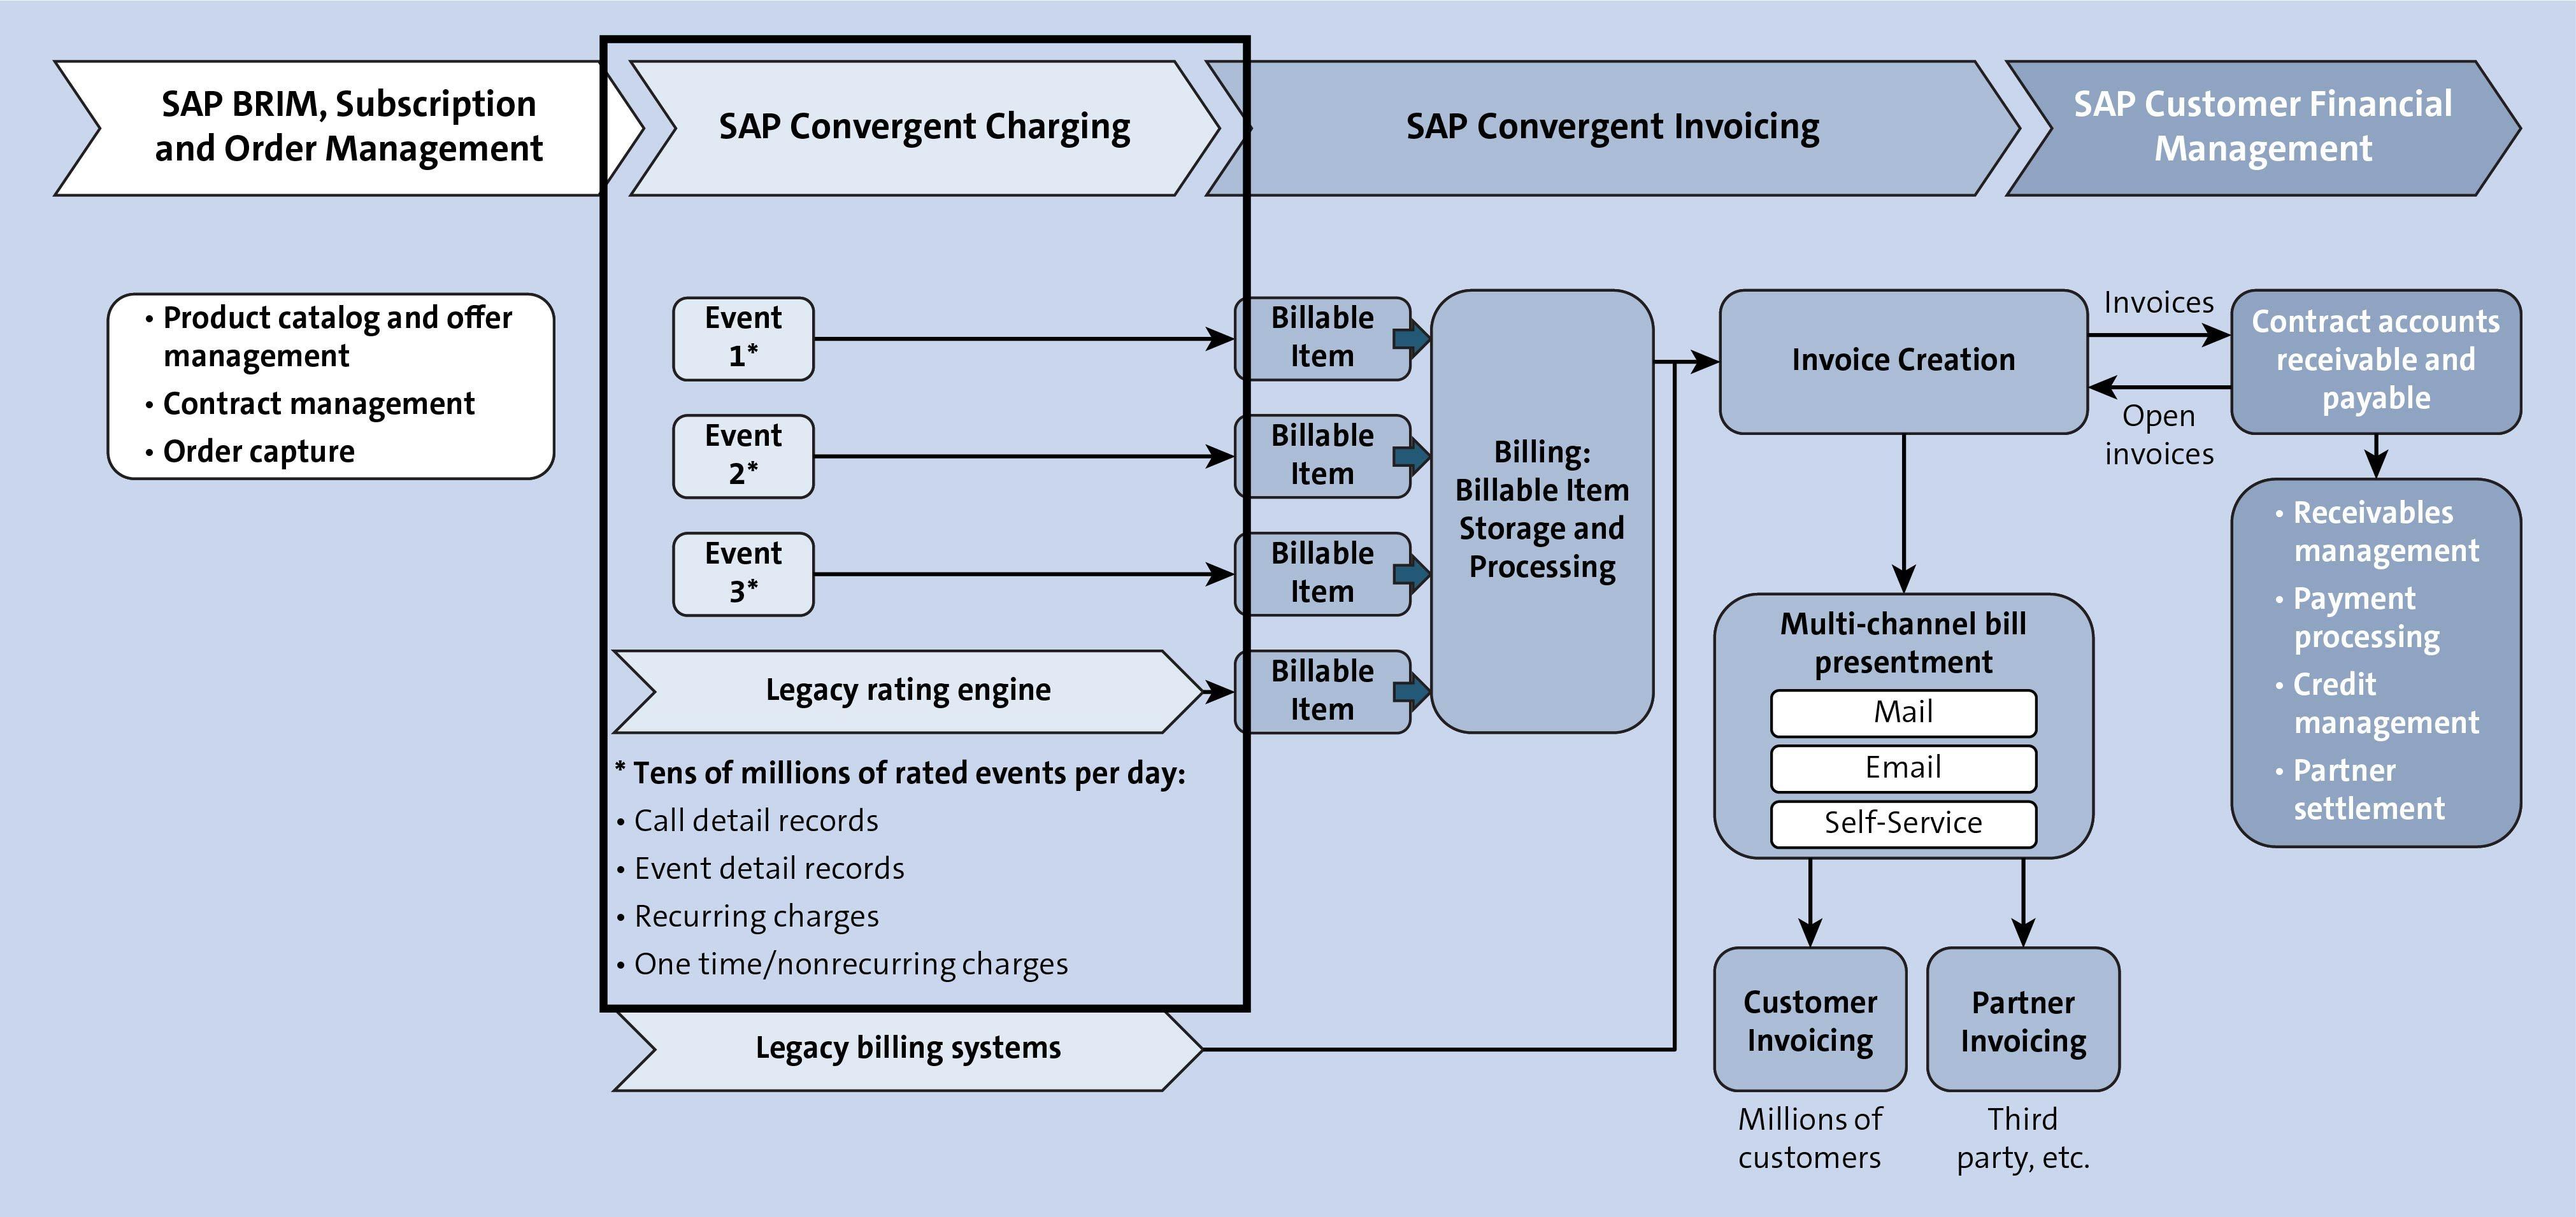 SAP Convergent Charging